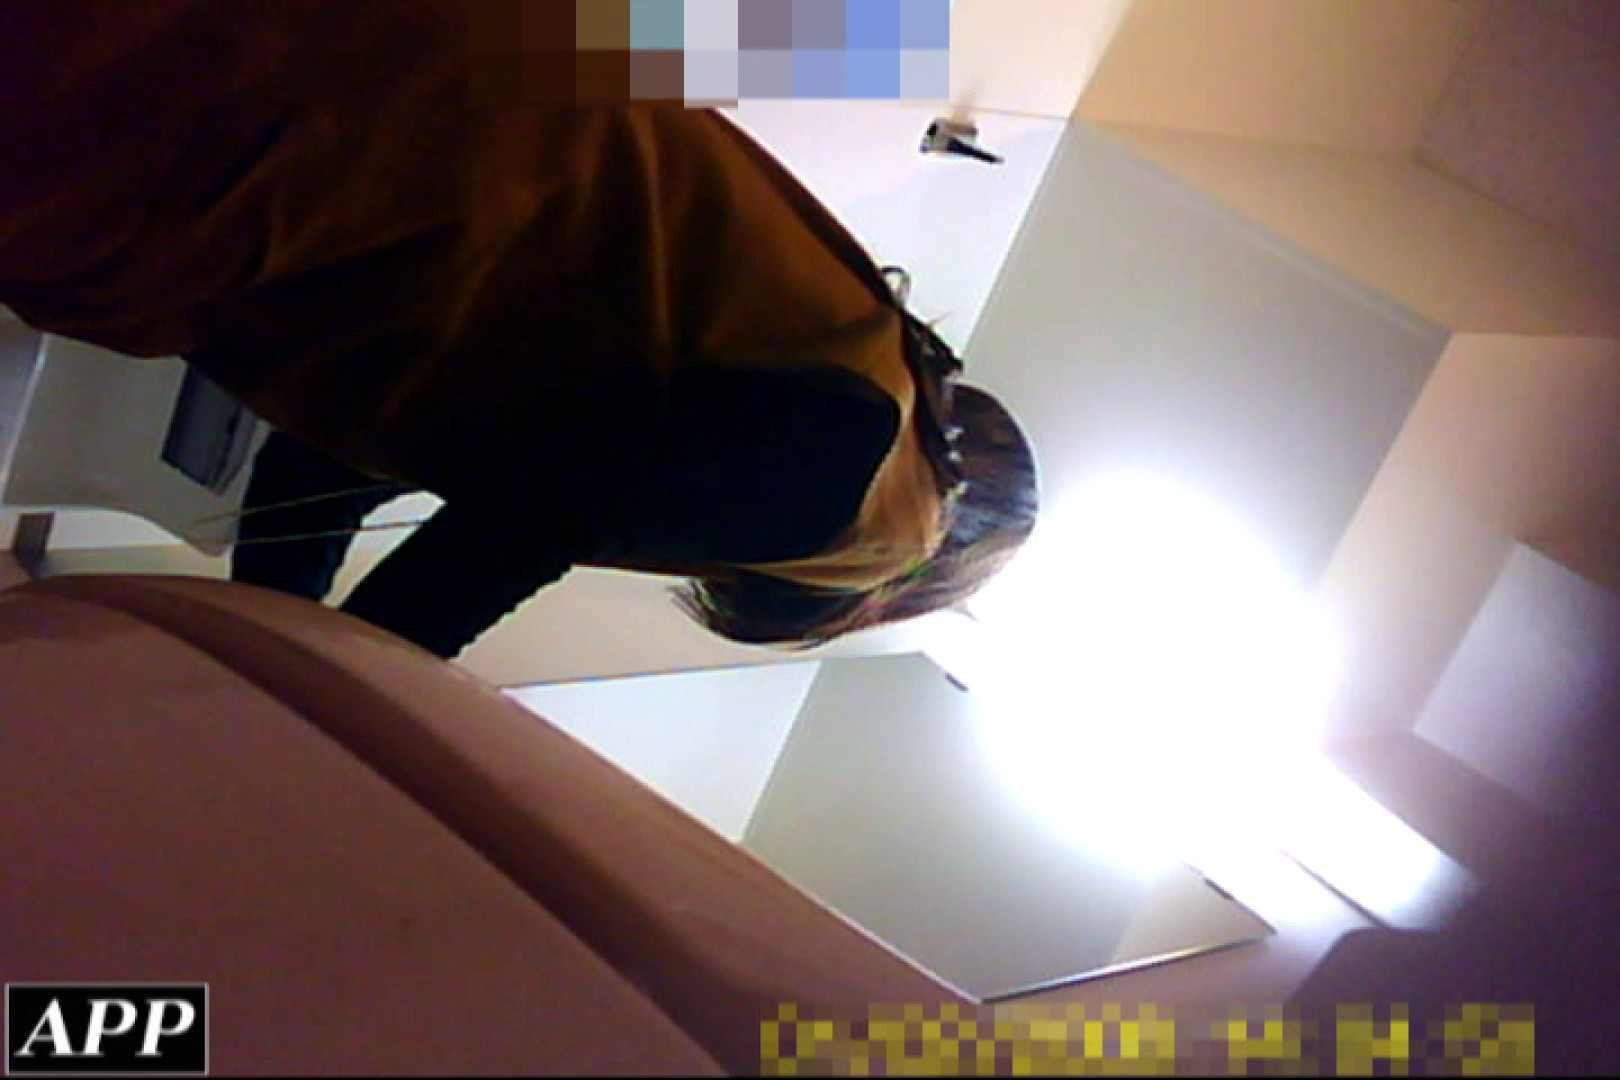 3視点洗面所 vol.051 OLセックス | 洗面所  105画像 103